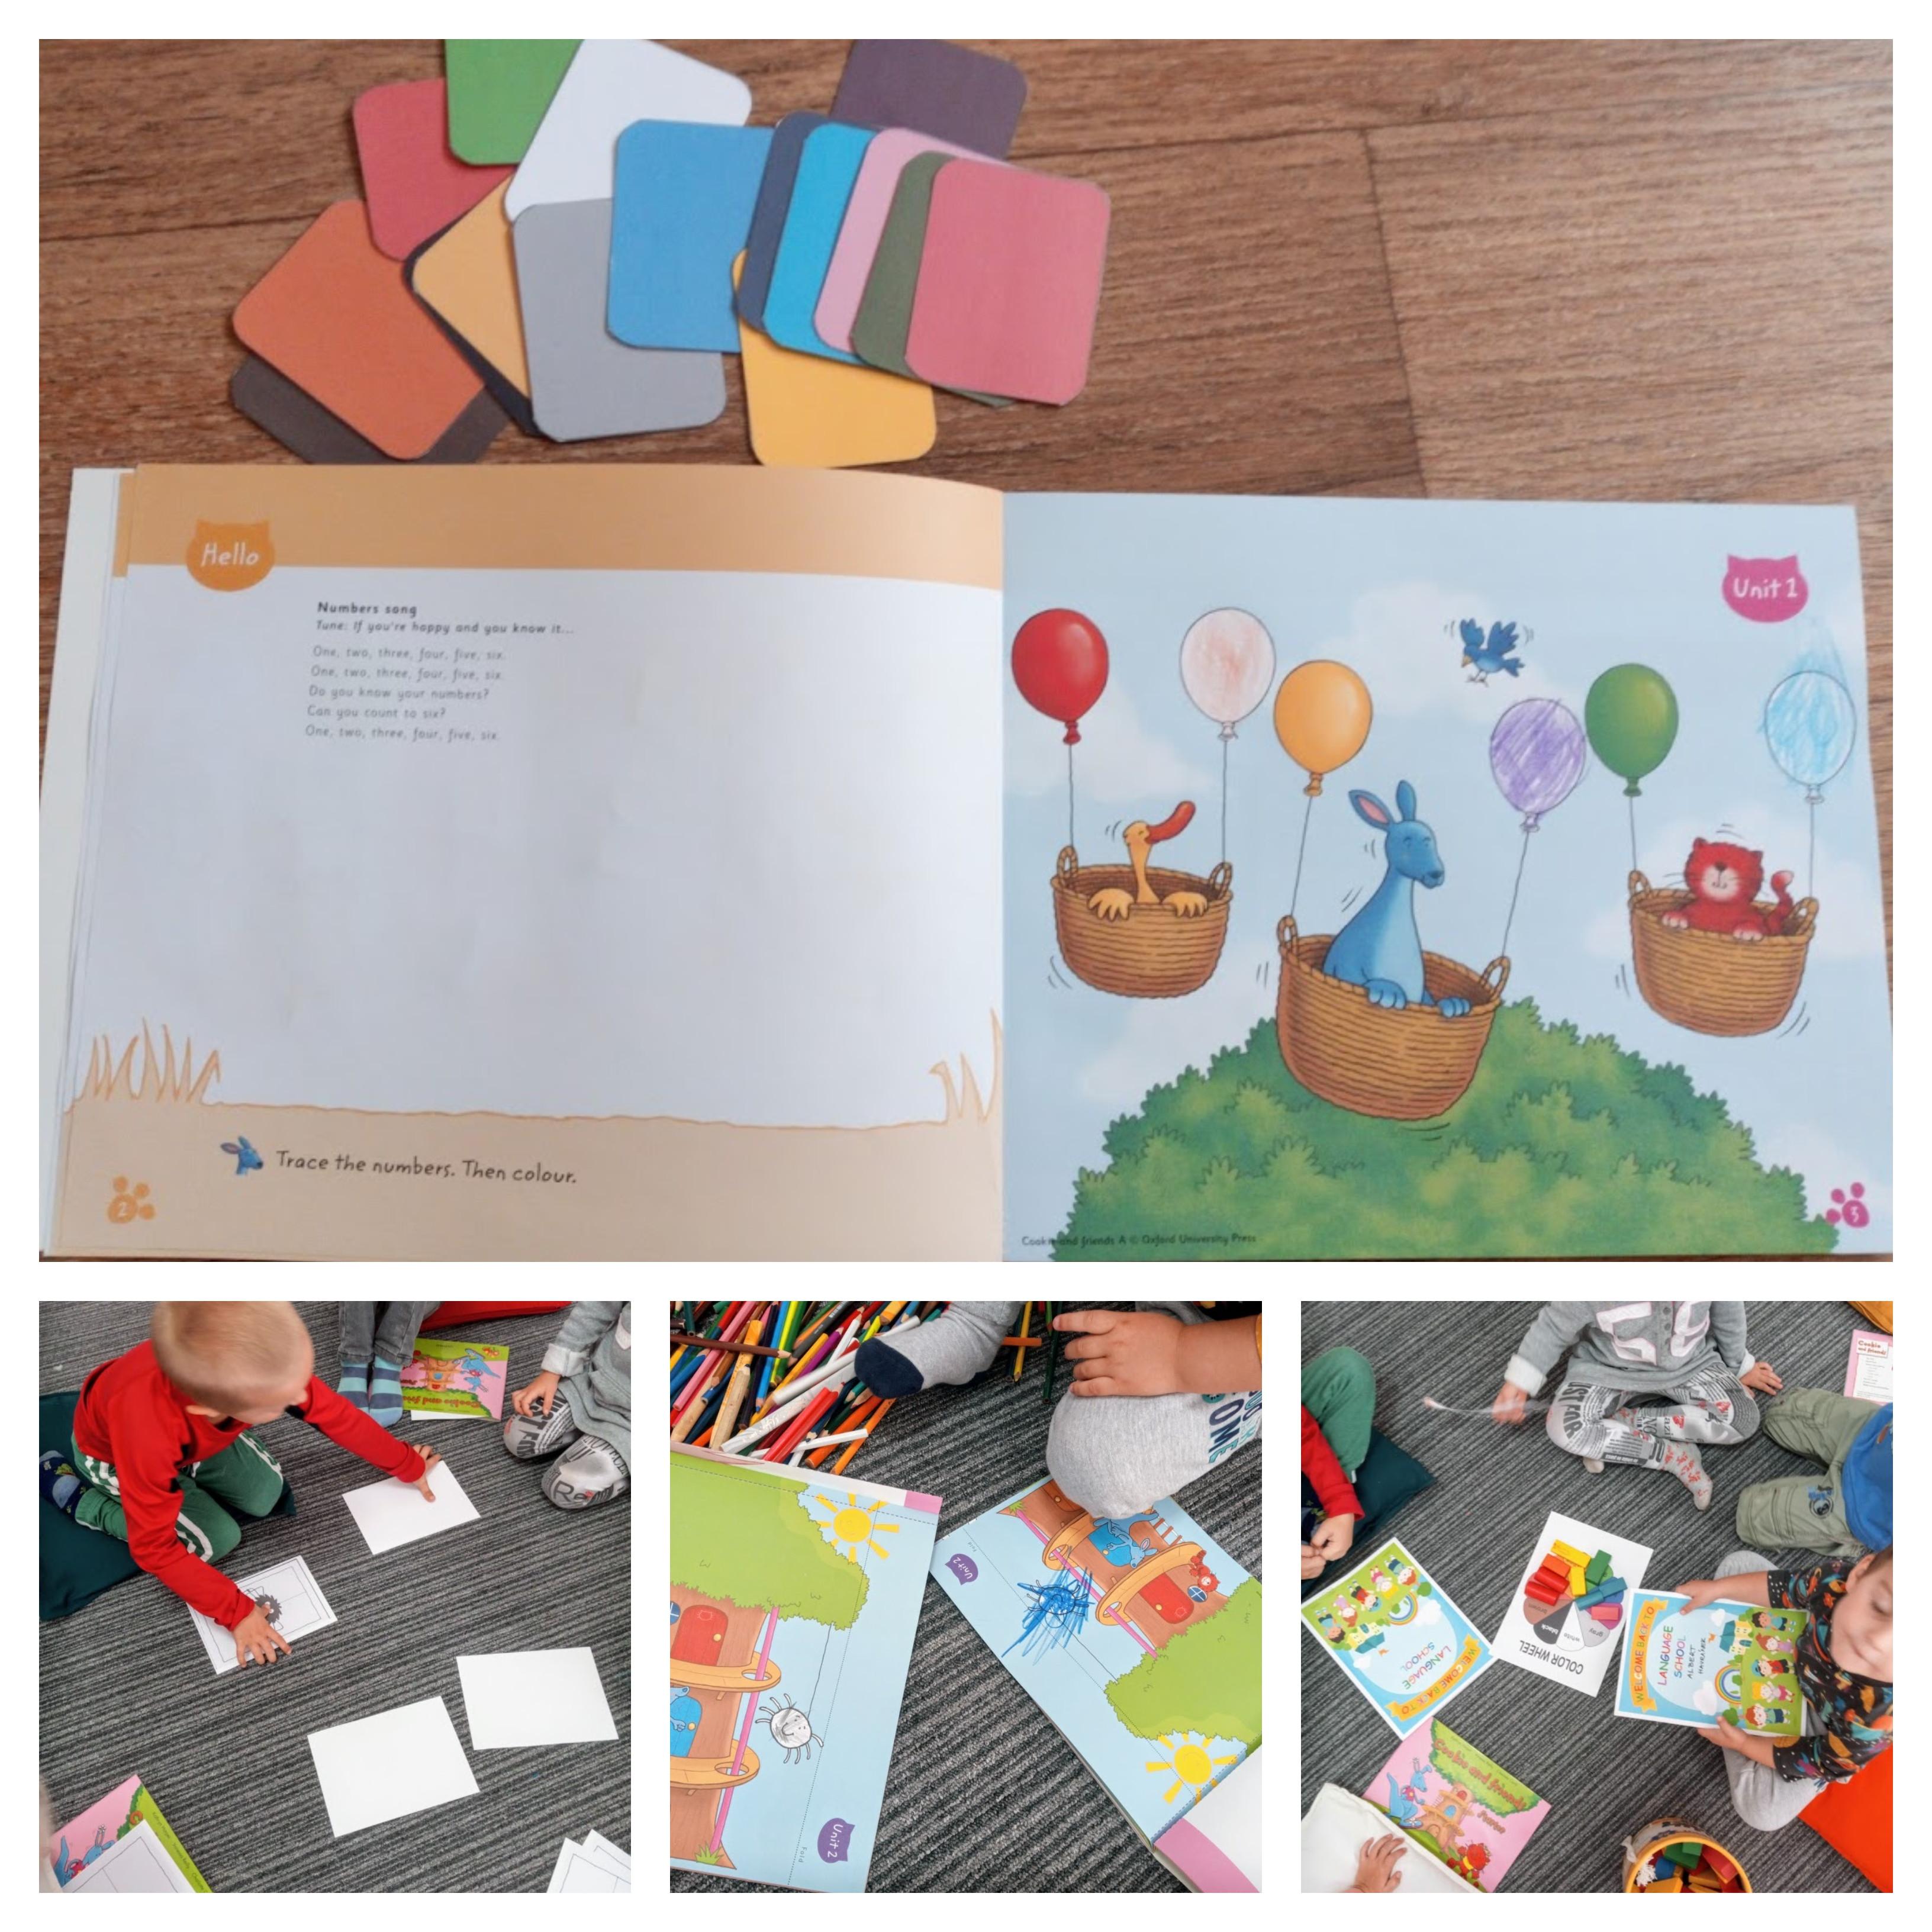 English for Kids (Freshly Aged 3)